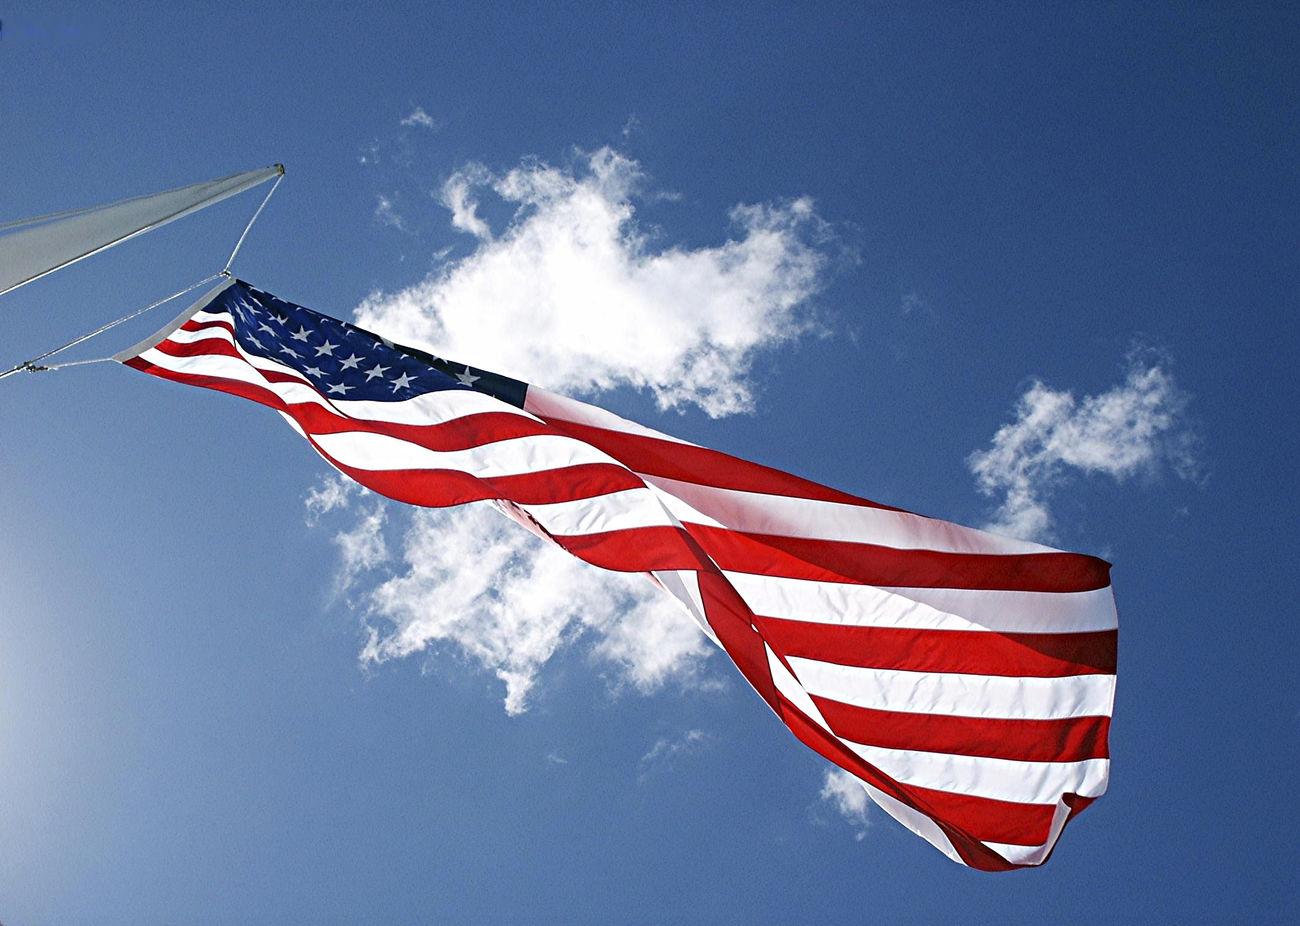 Uss Arizona Memorial Flag flying at half staff.